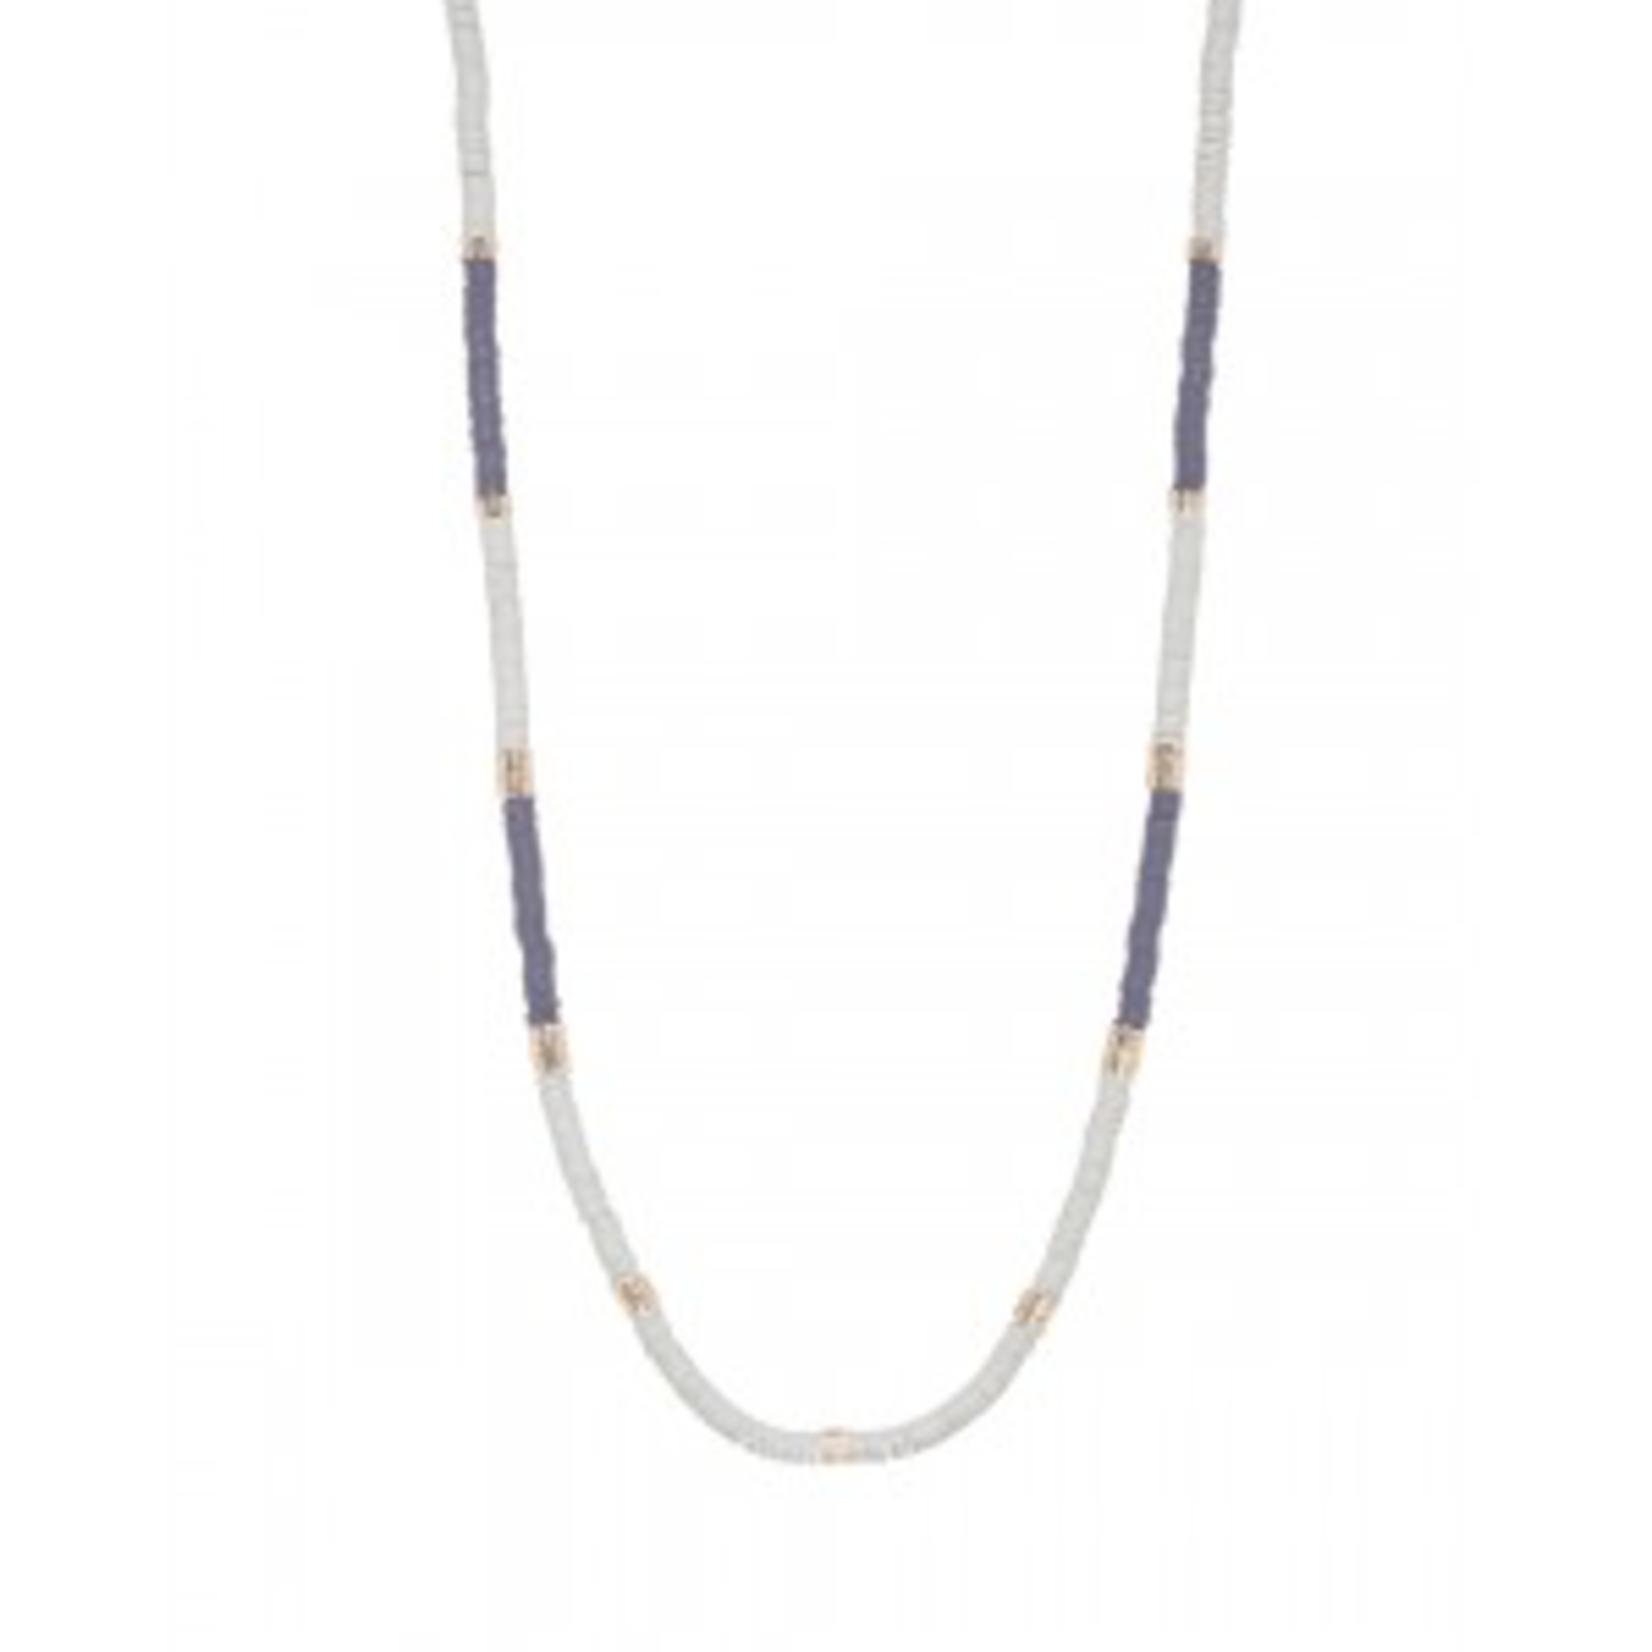 Mark Watson Gold Navy Hartshorn Necklace